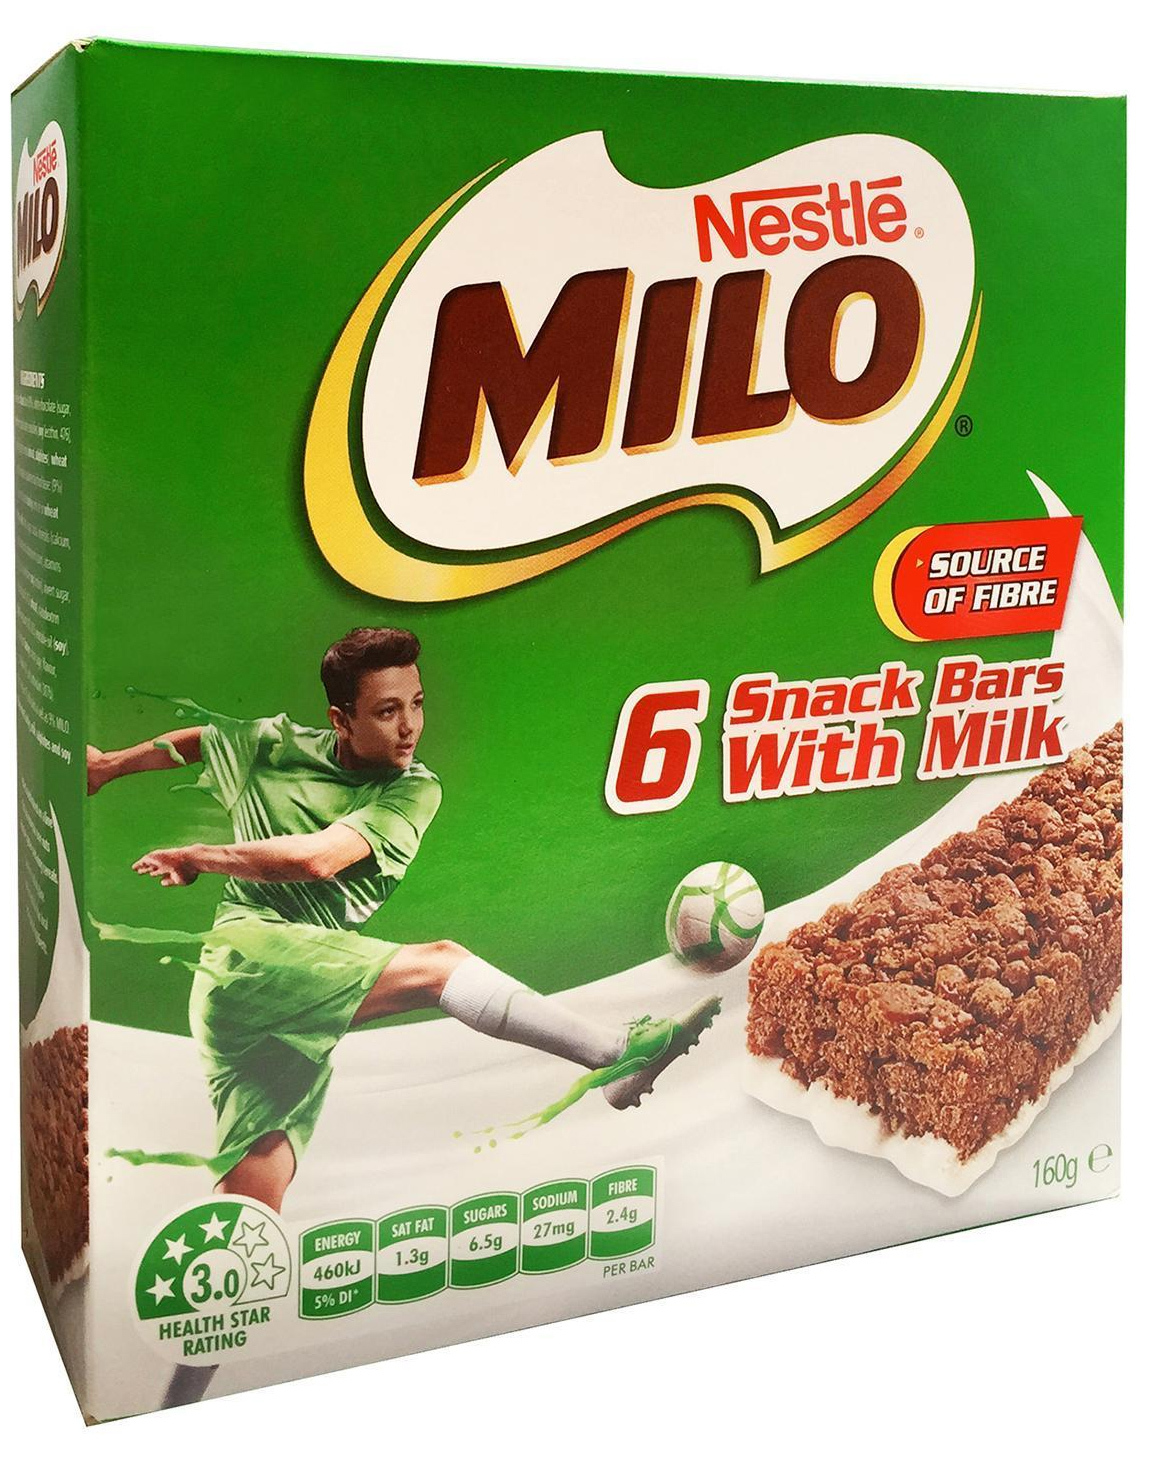 MILO Snack Bars With Milk (36 Bars) image